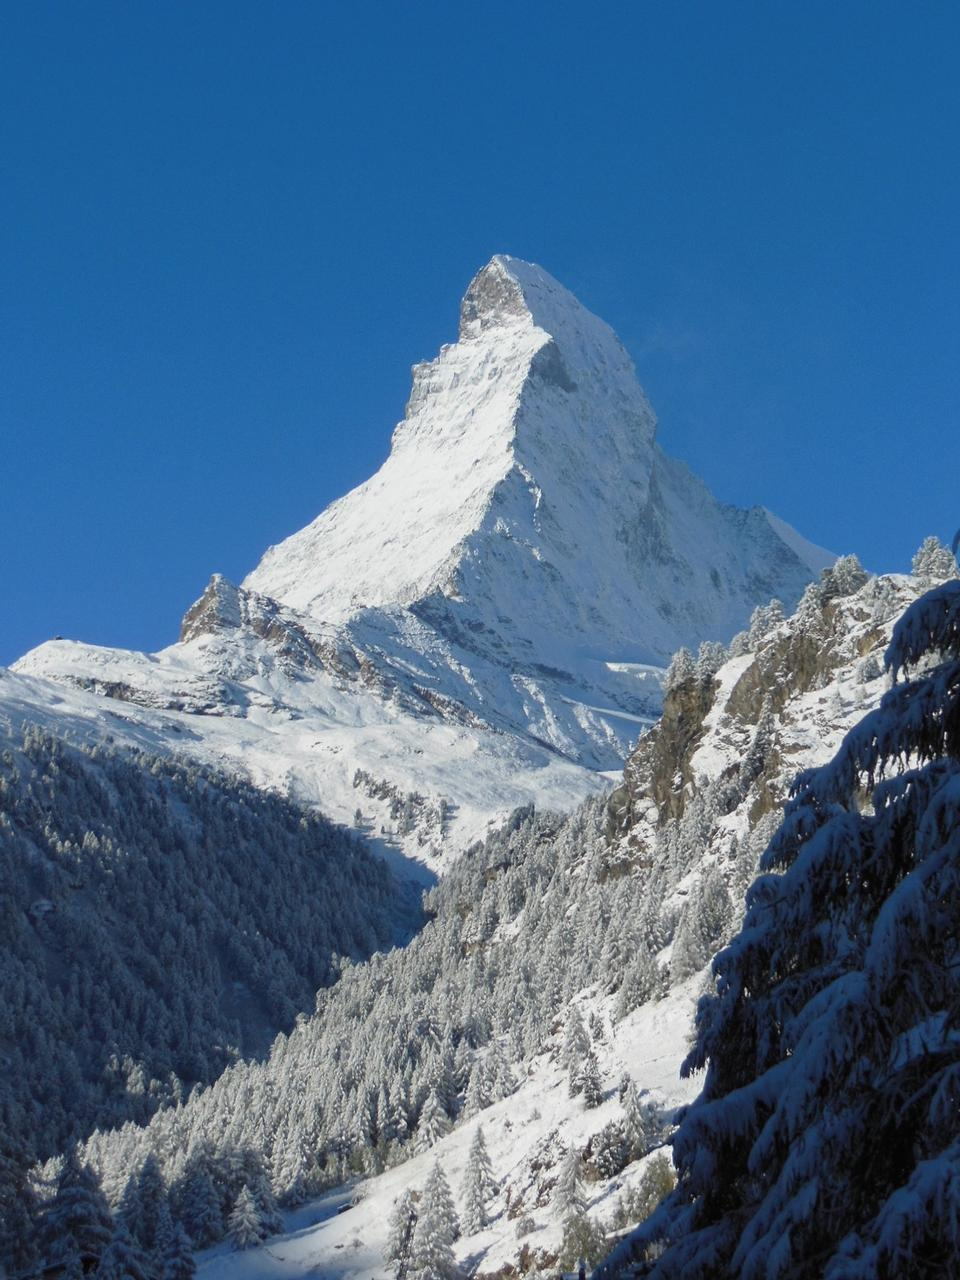 Alpine Mountain Snow Landscape Matterhorn Zermatt